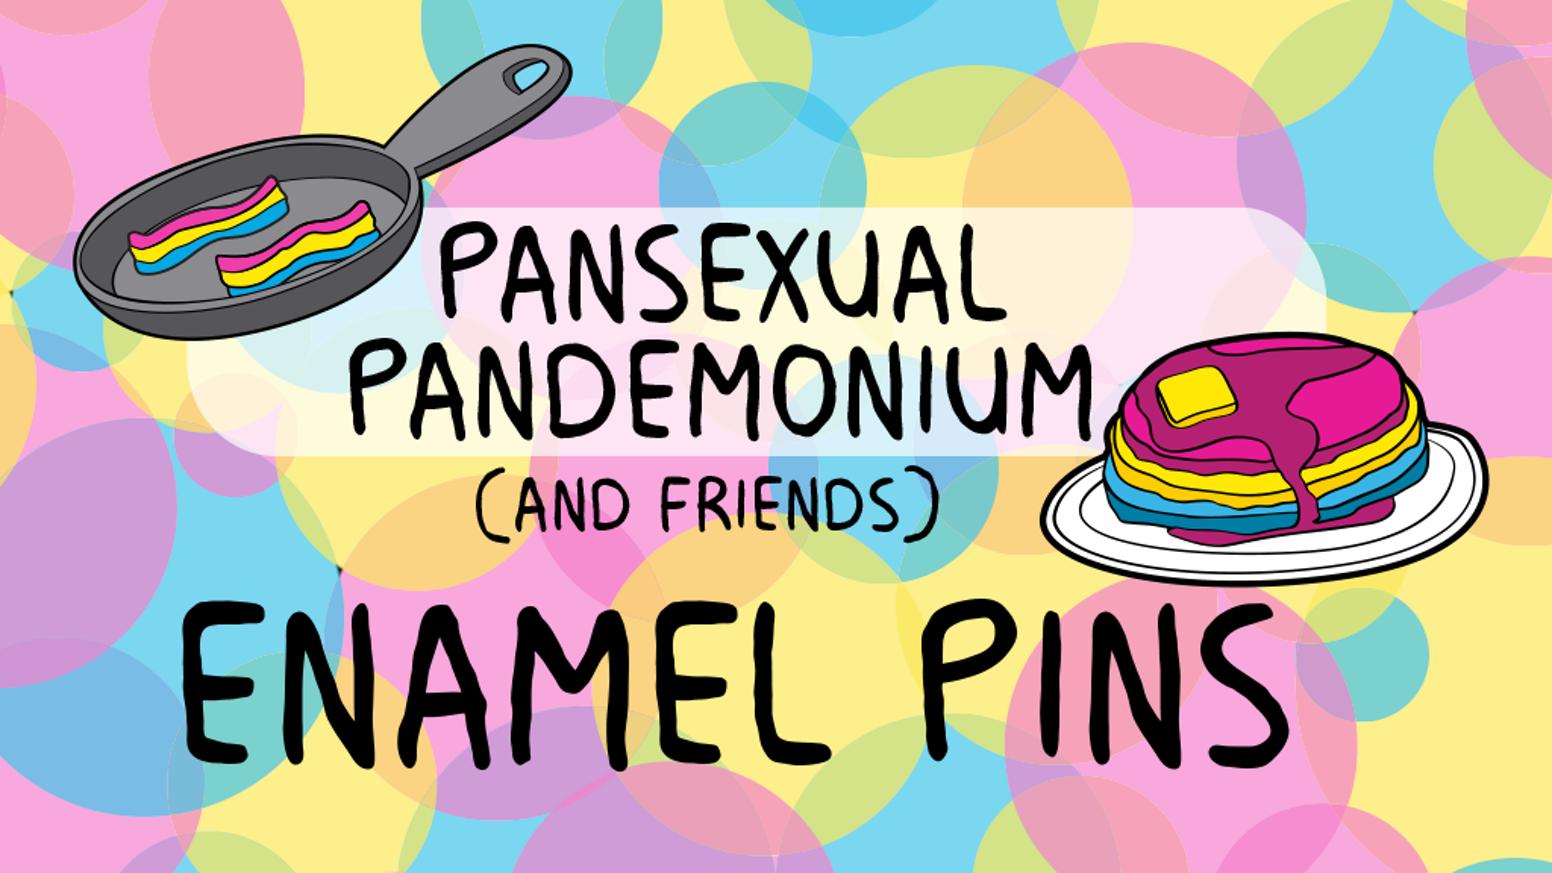 Pansexual pandemonium enamel pins. Brunch clipart lgbt